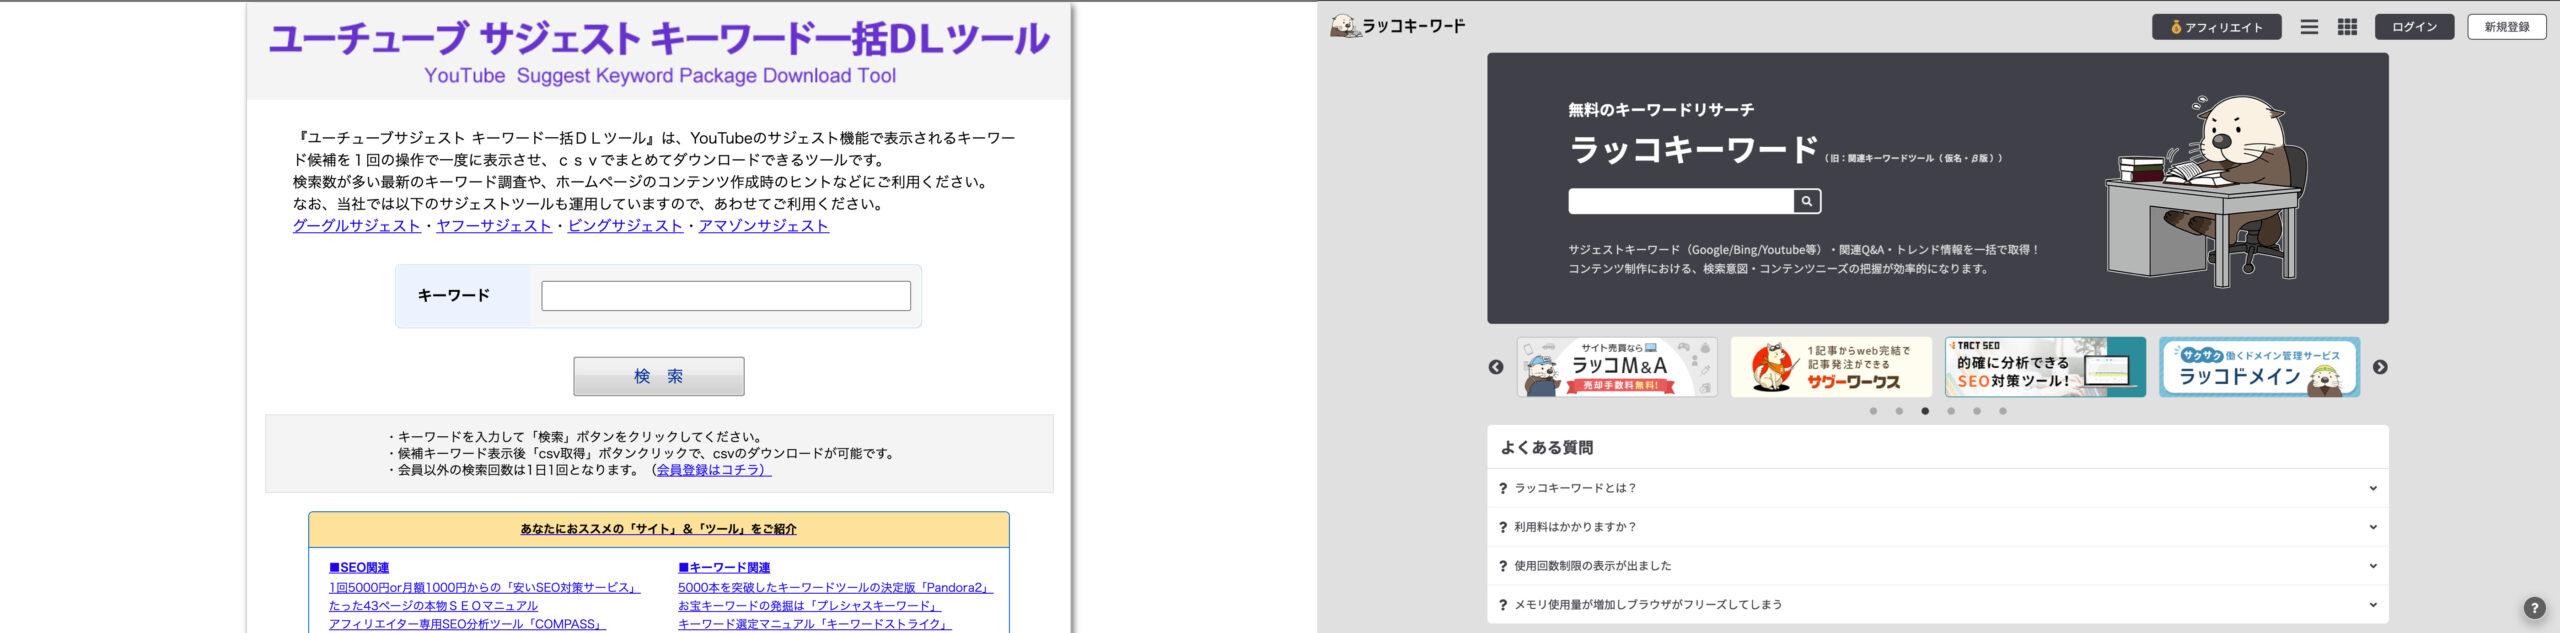 youtubeseo-keyword tool